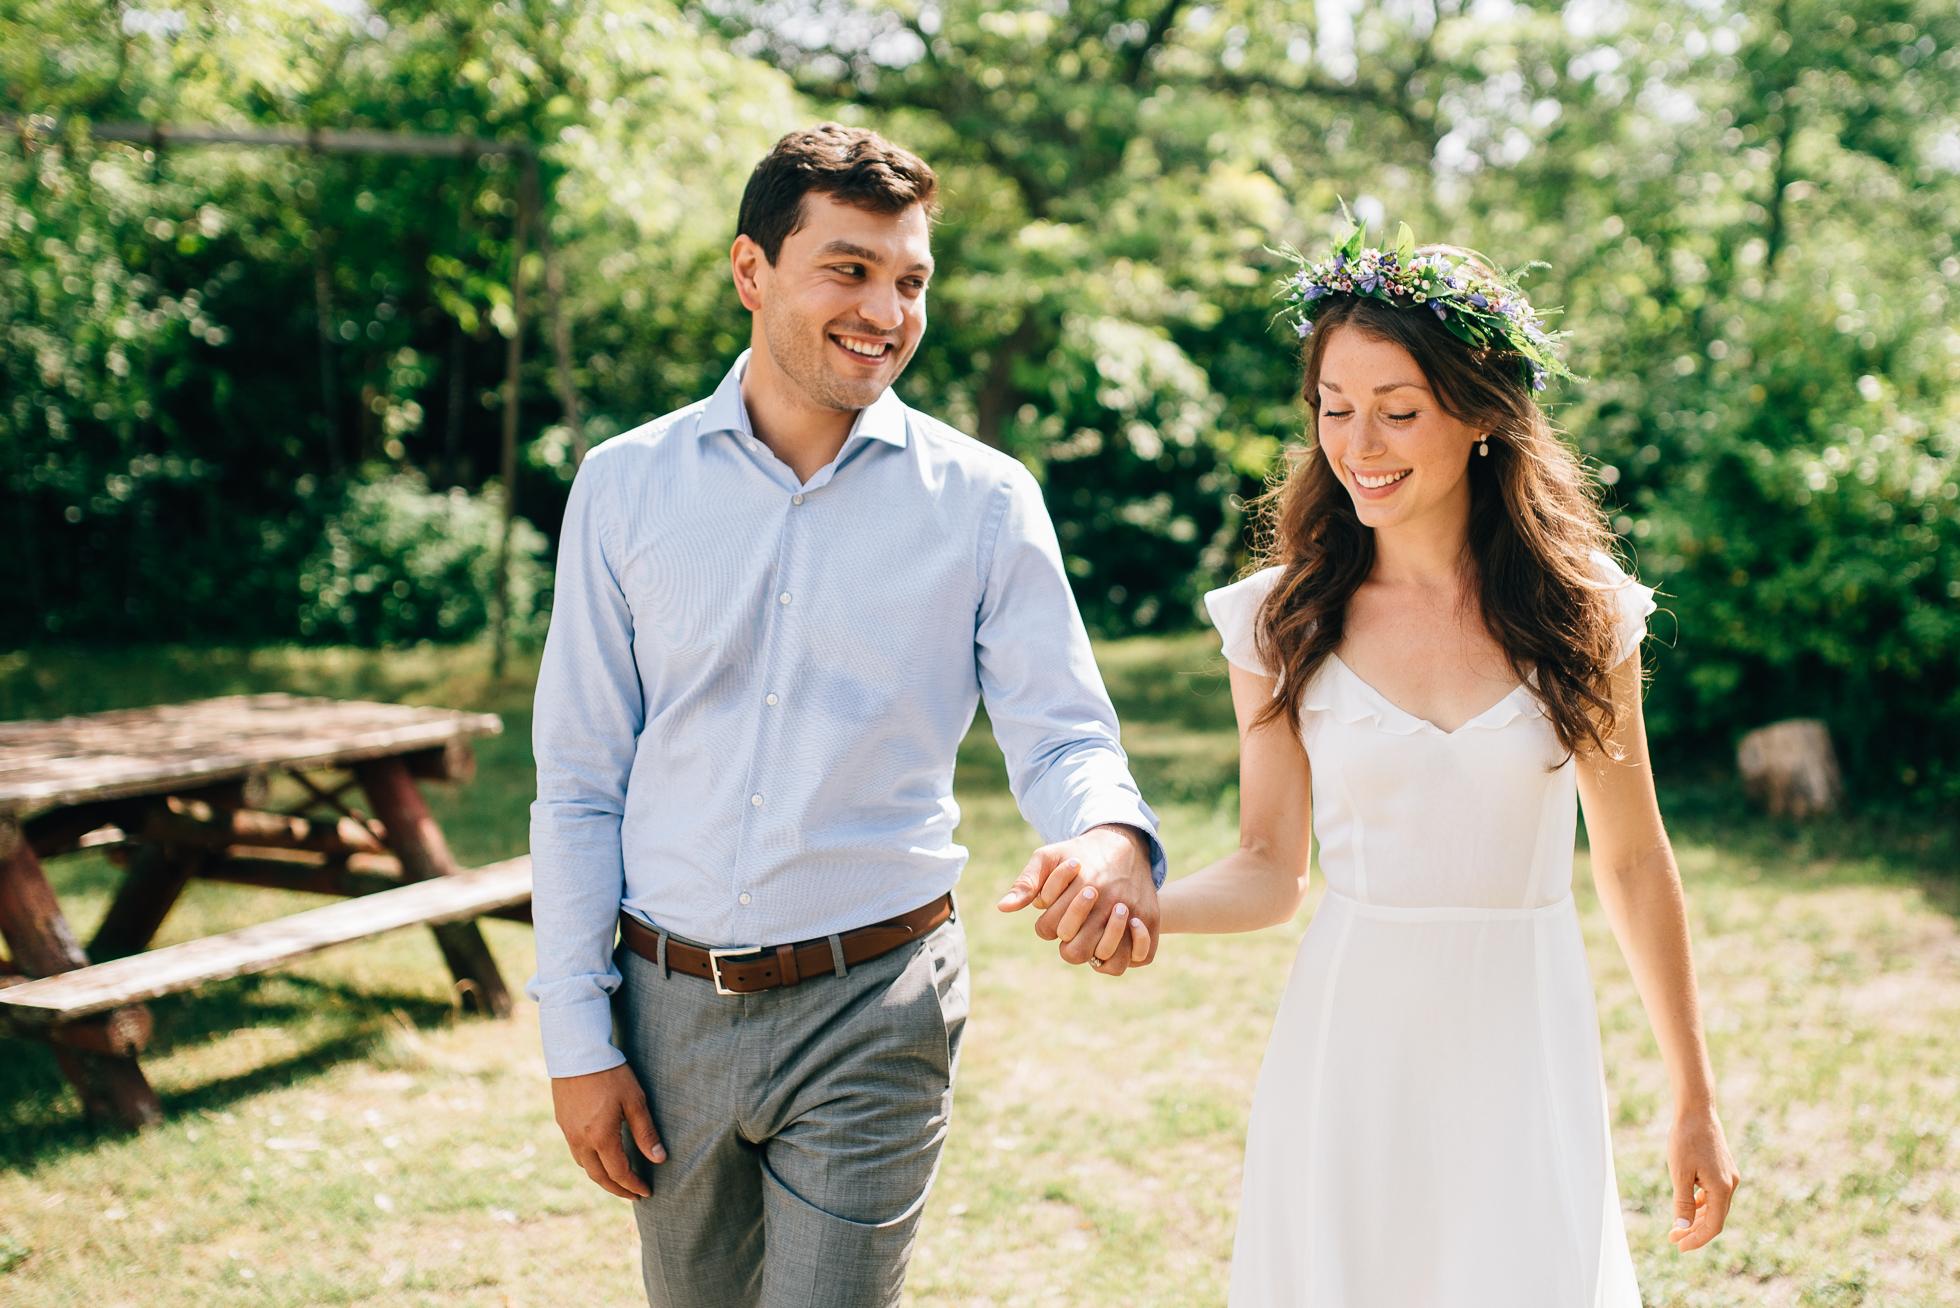 Artscape-Gibraltar-Point-Wedding-Photography018.jpg